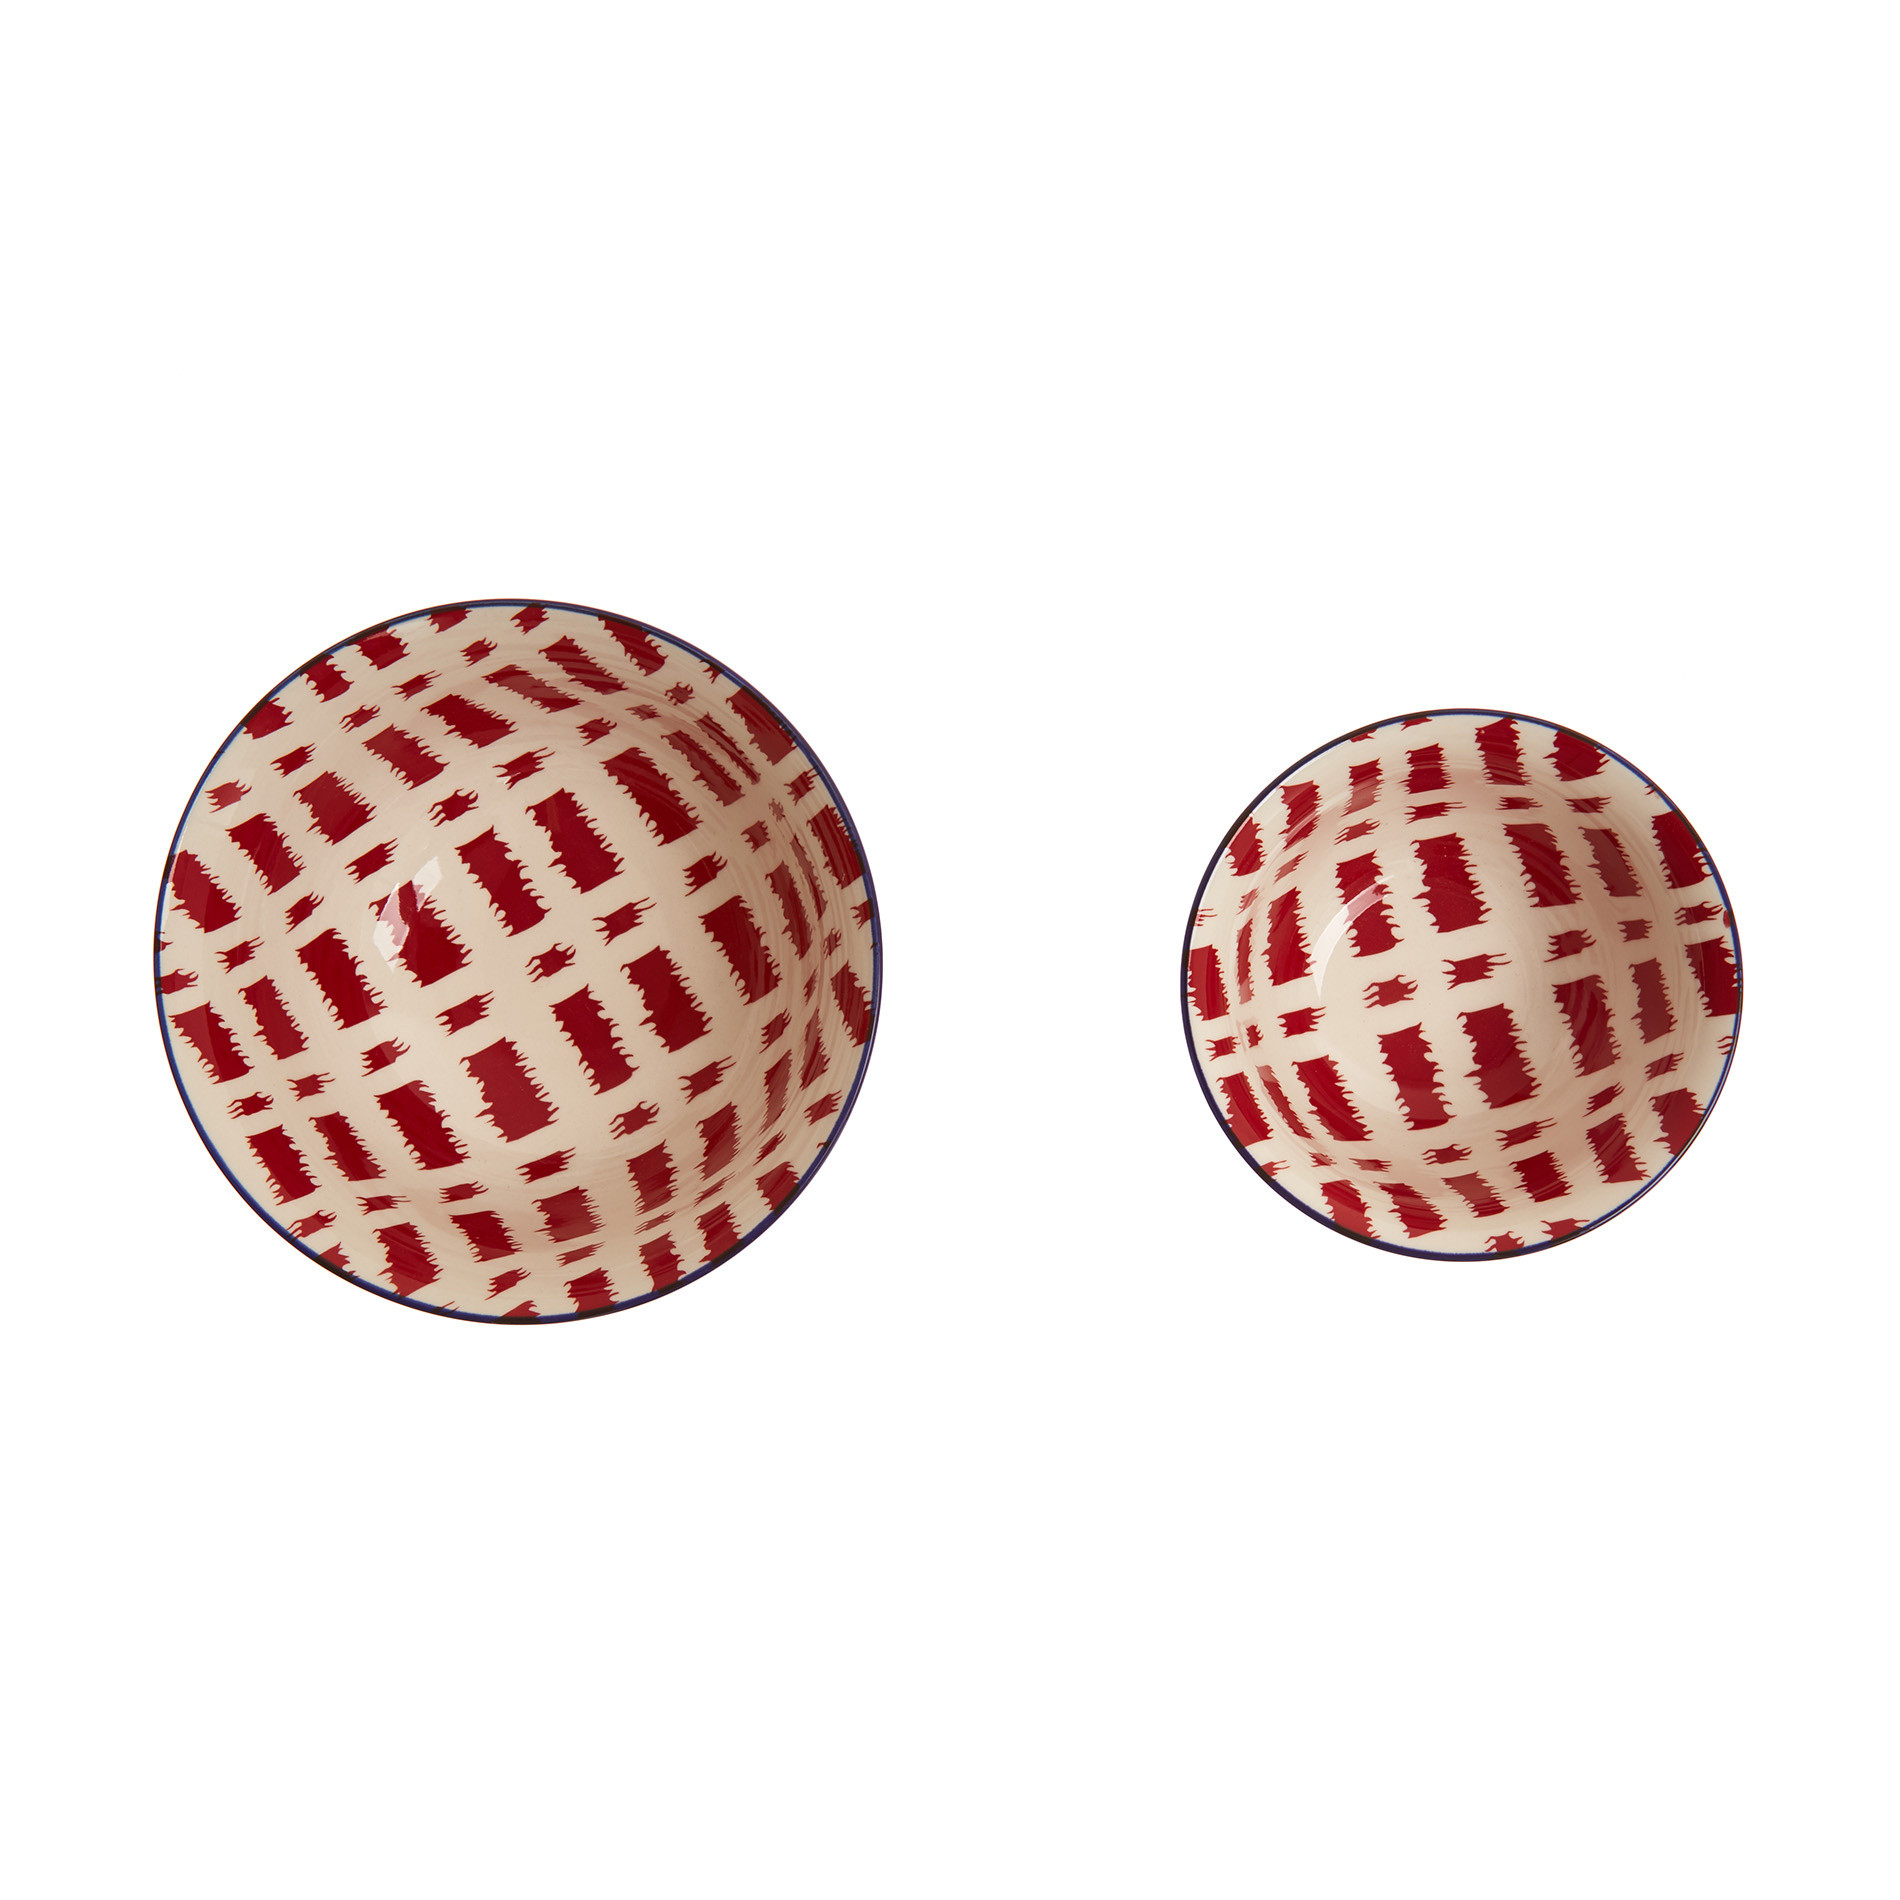 Coppetta stoneware motivo geometrico, Rosso, large image number 1